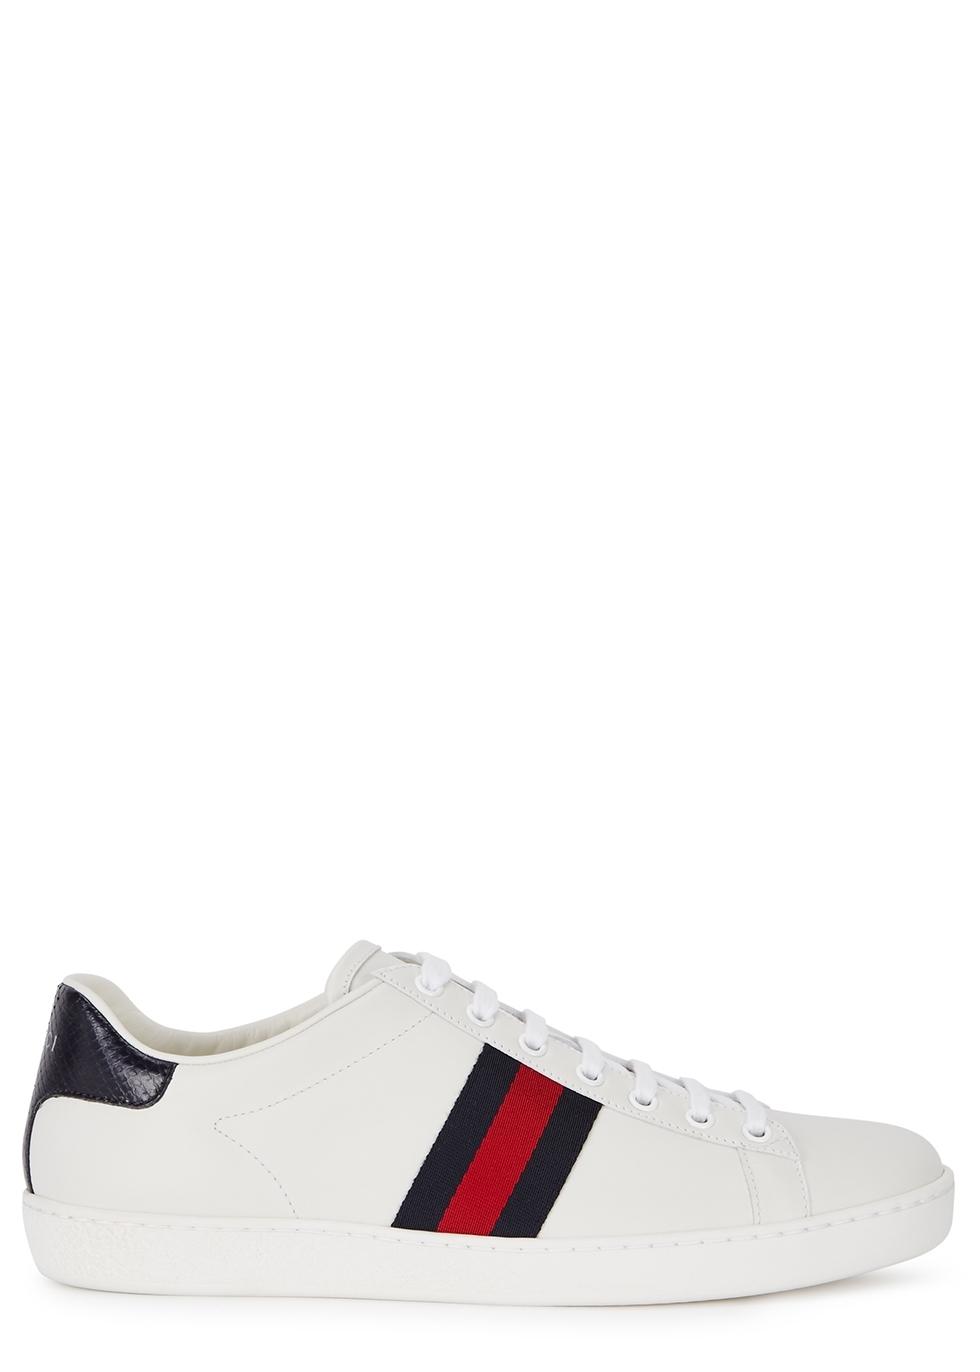 86c15dd59b7 Gucci Trainers - Womens - Harvey Nichols